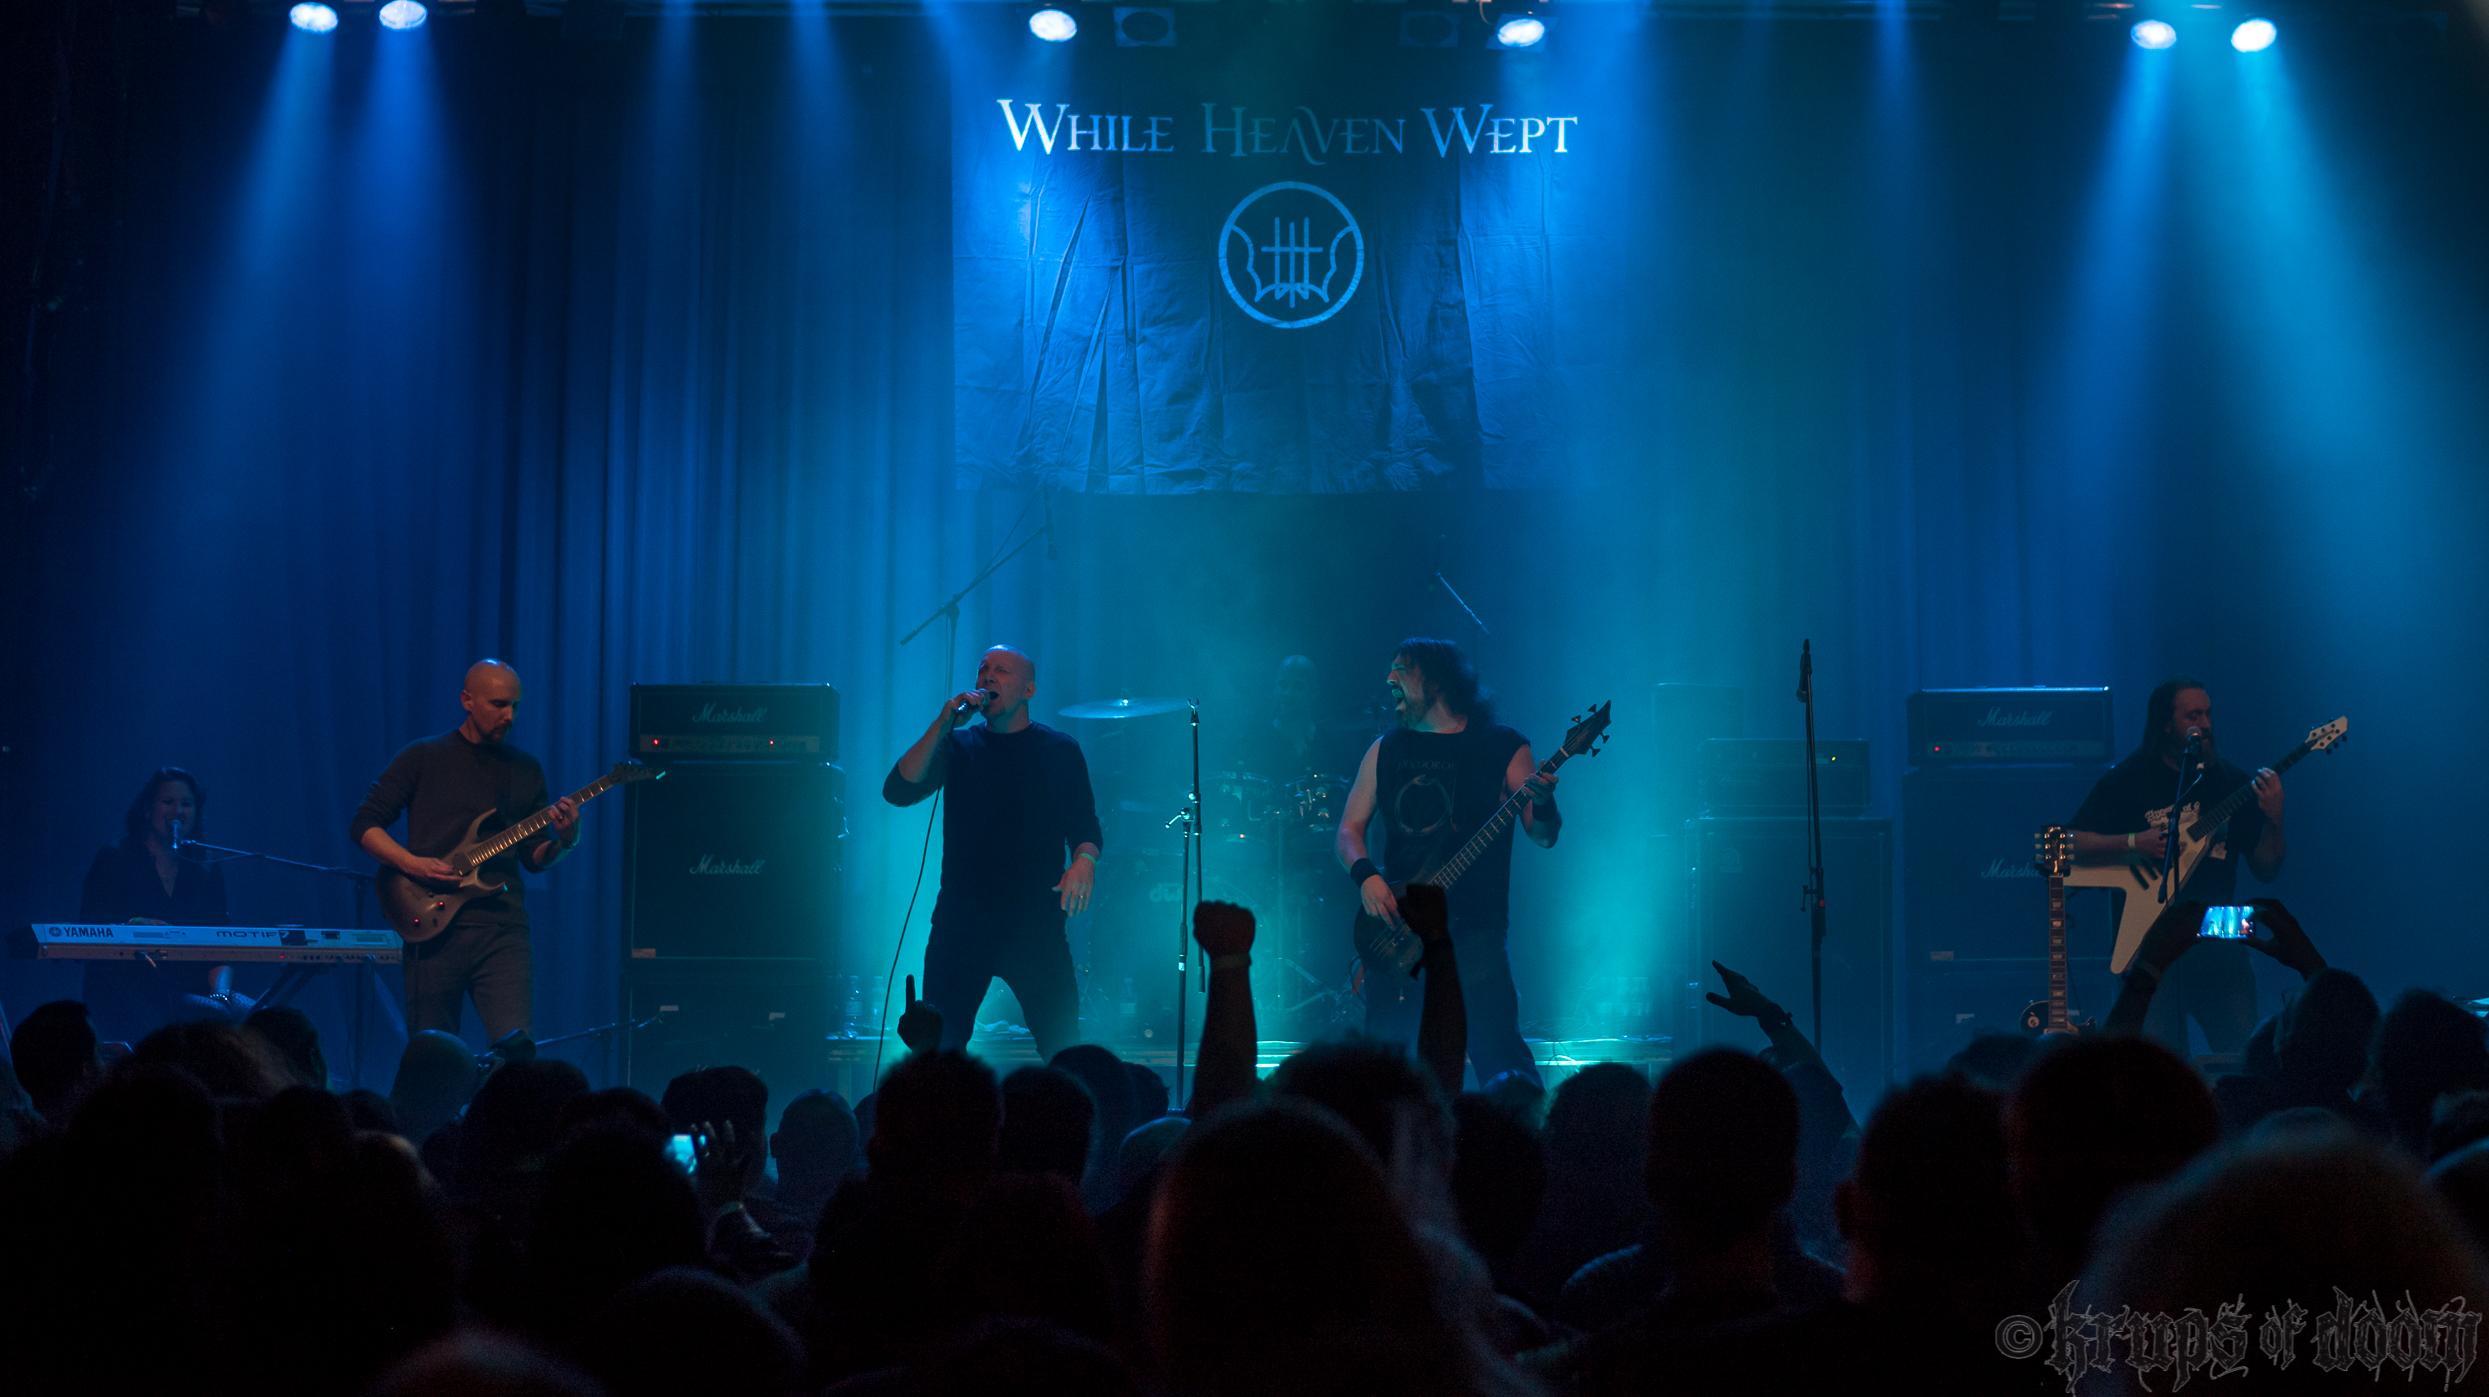 While Heaven Wept_Hammer of Doom 2018 -8541